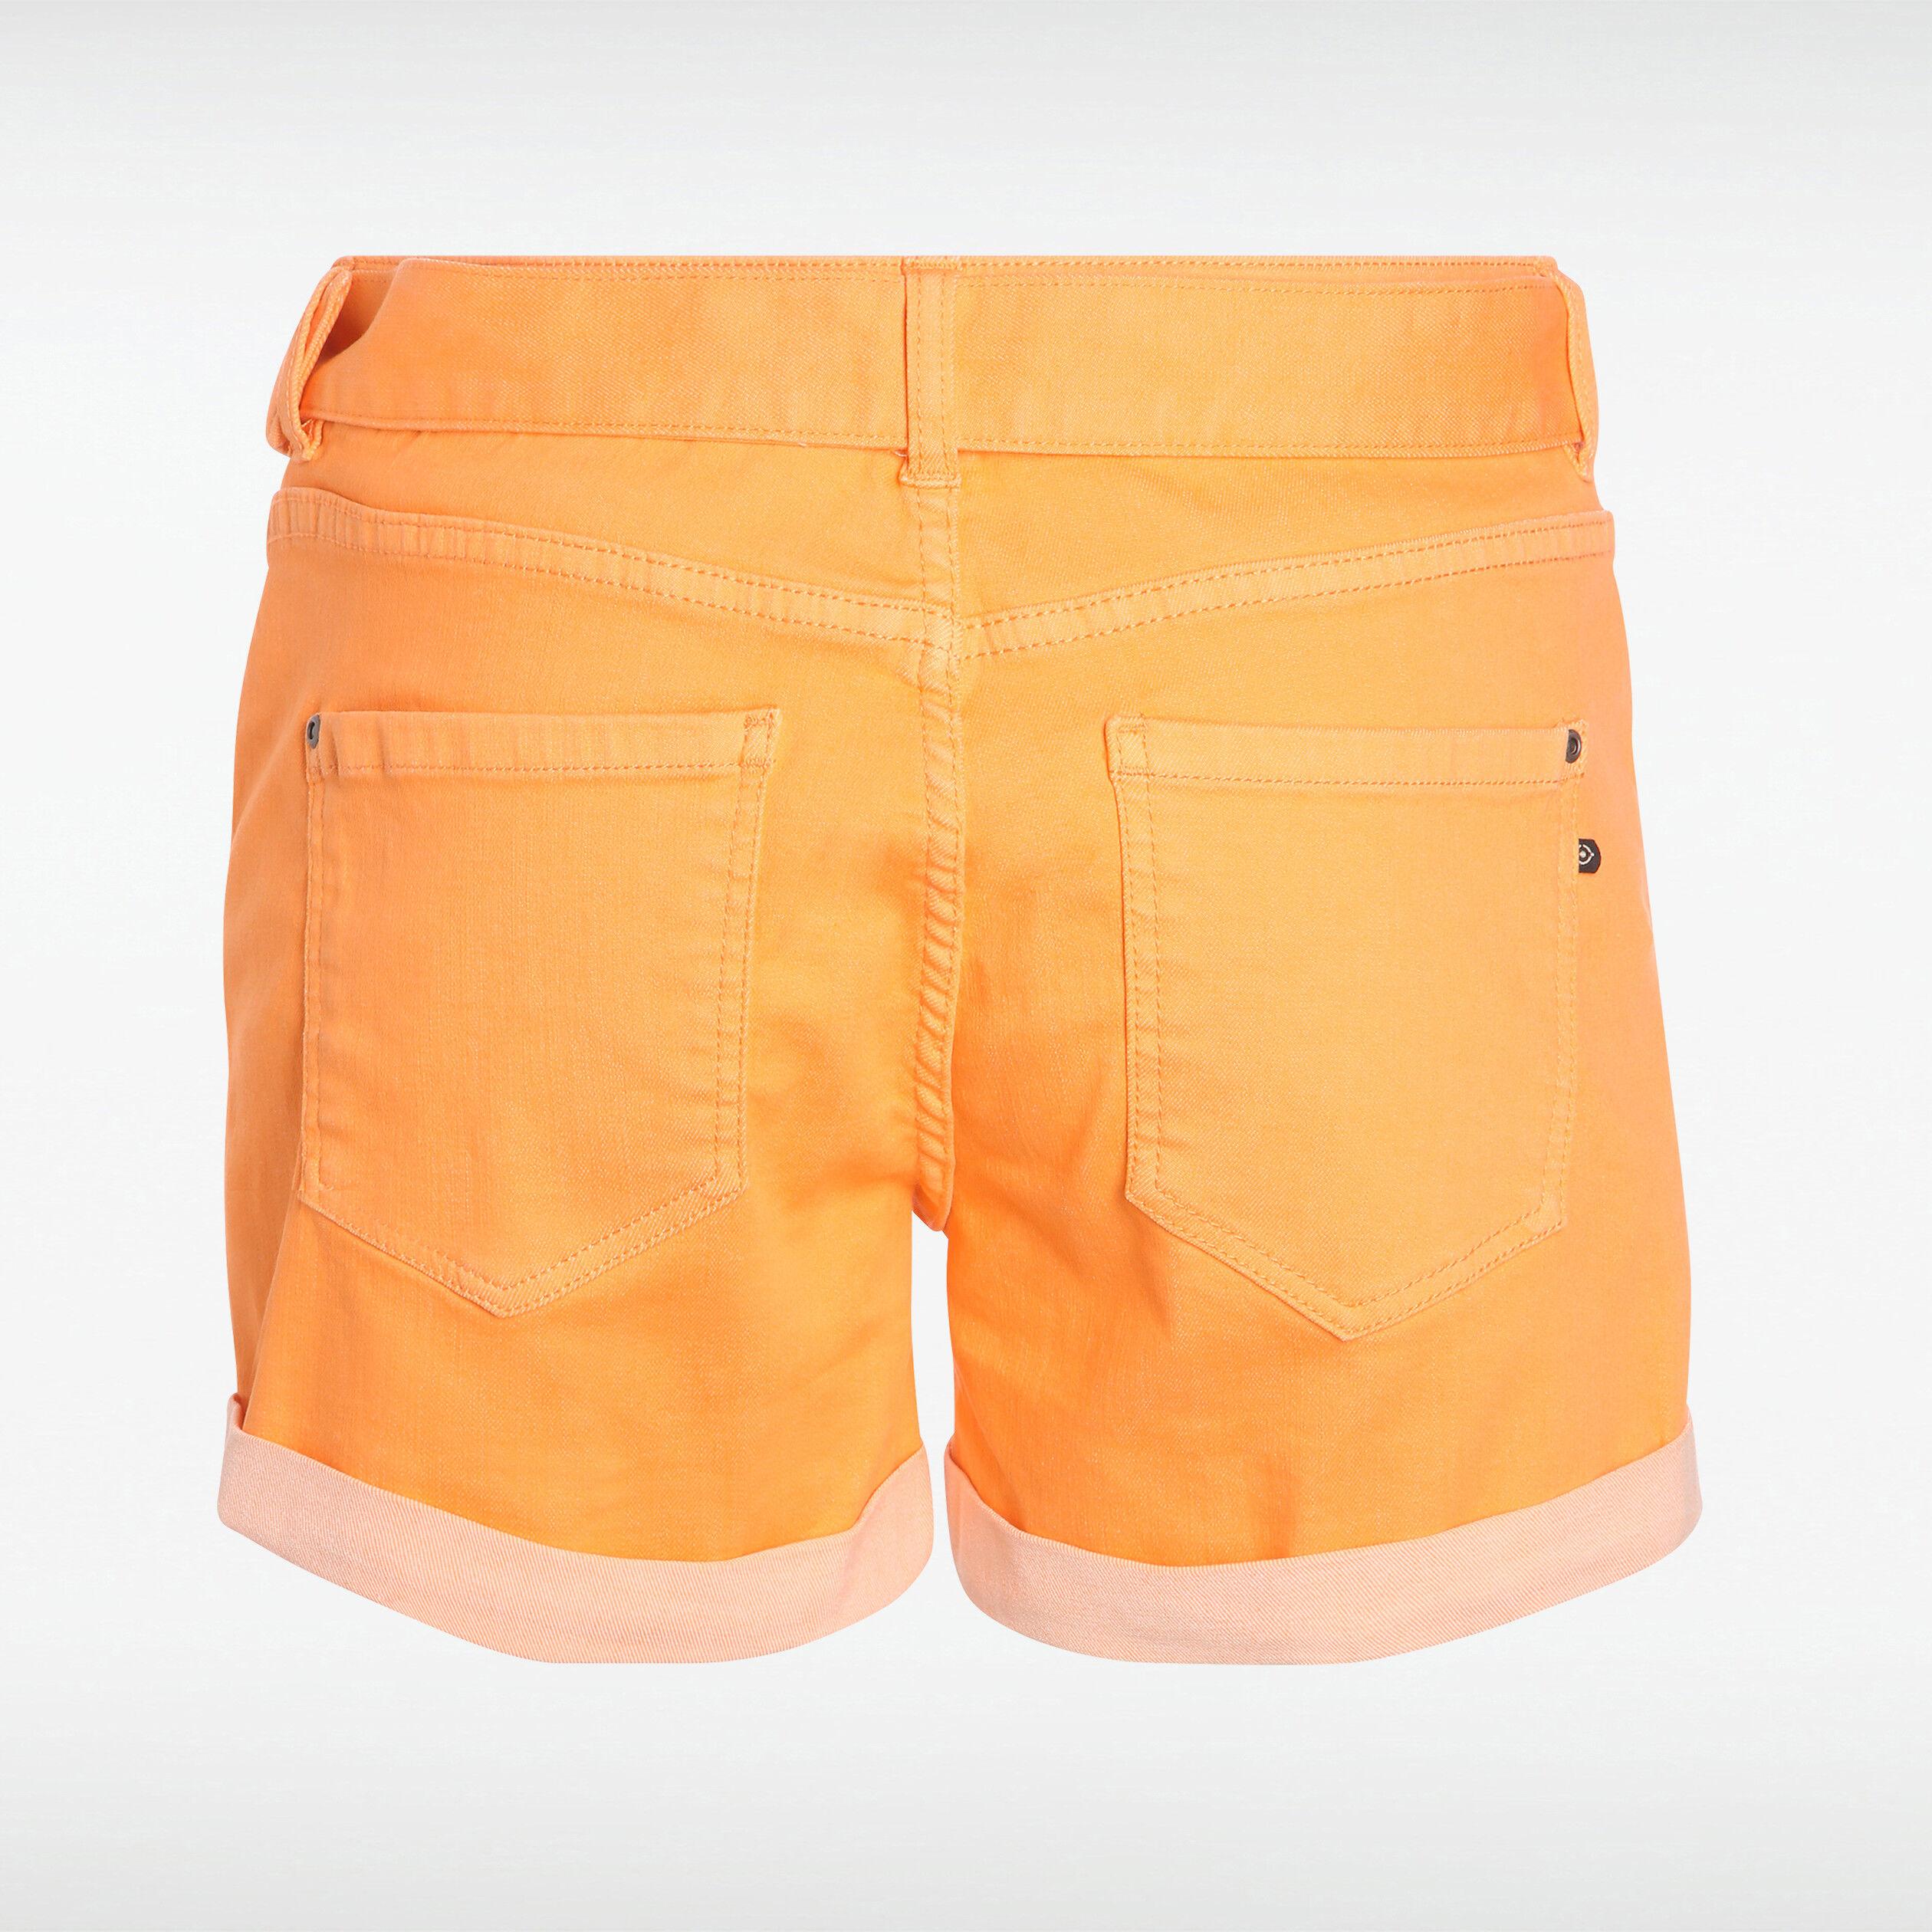 Short orange femme   Vib's